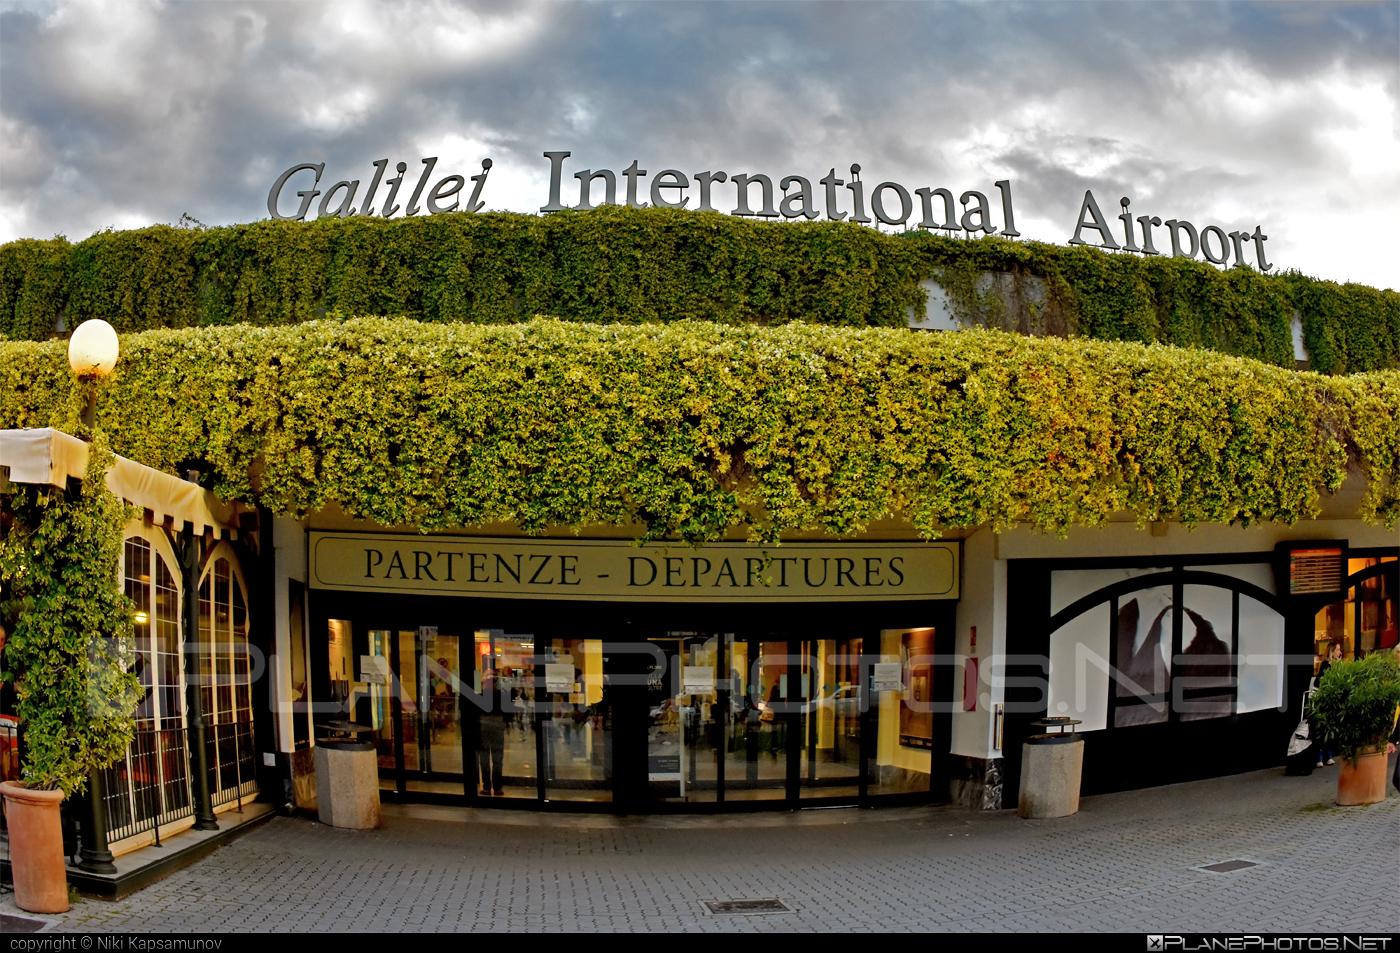 Pisa Galileo Galilei airport overview